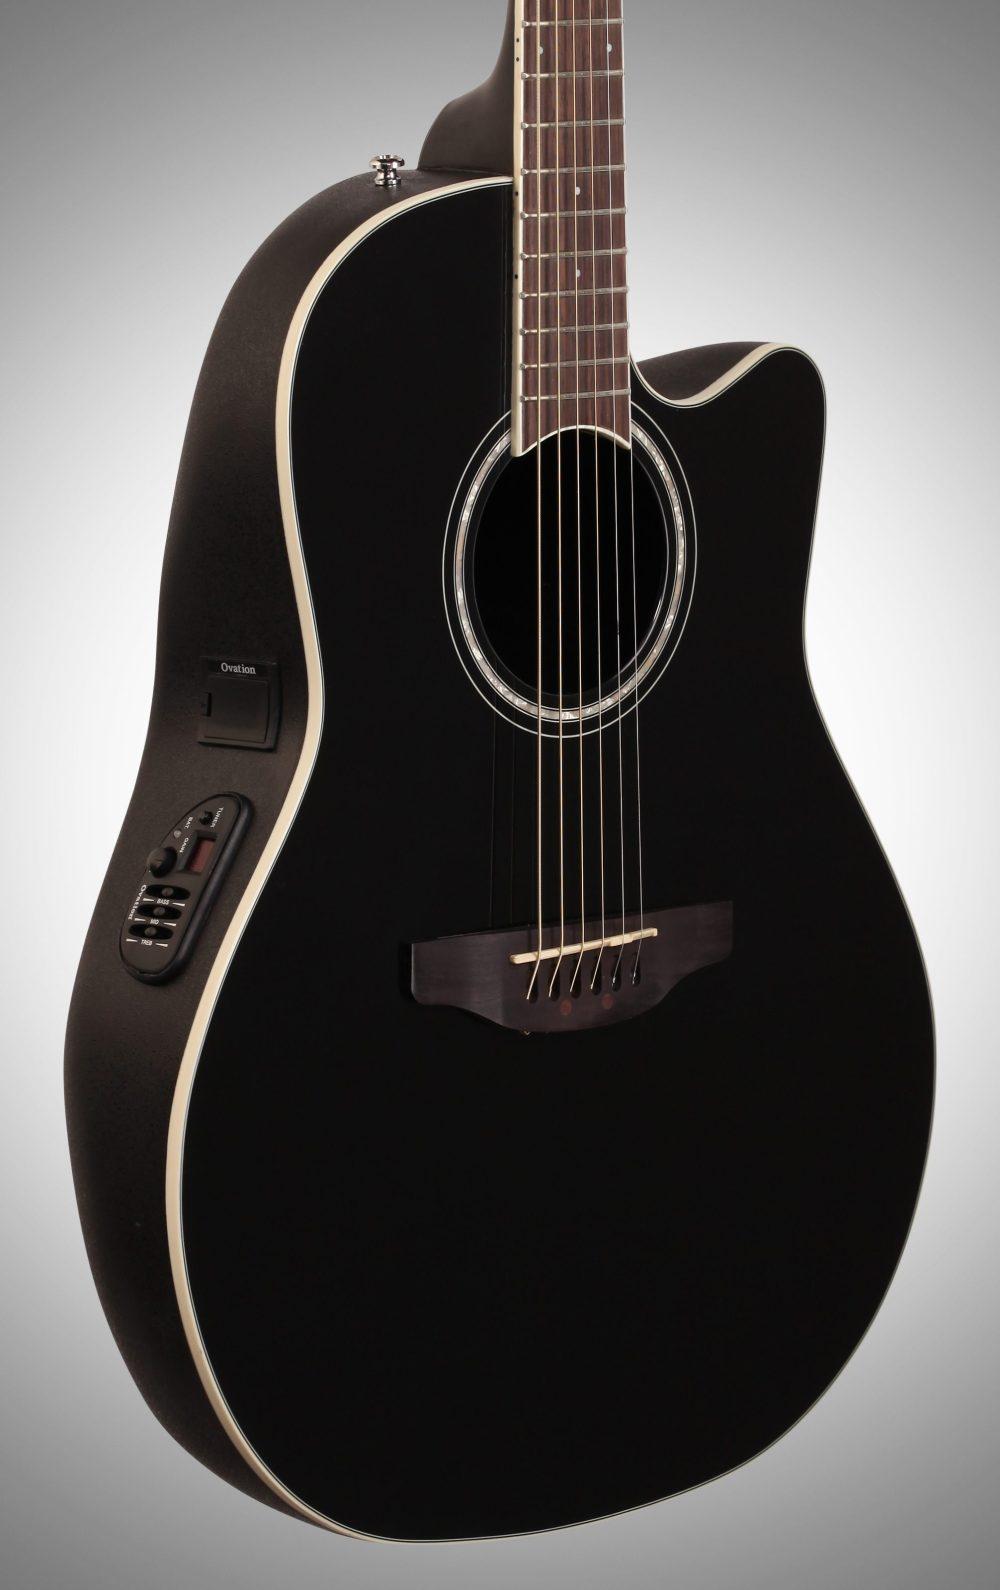 medium resolution of  ovation cs24 celebrity standard acoustic electric guitar black full left front